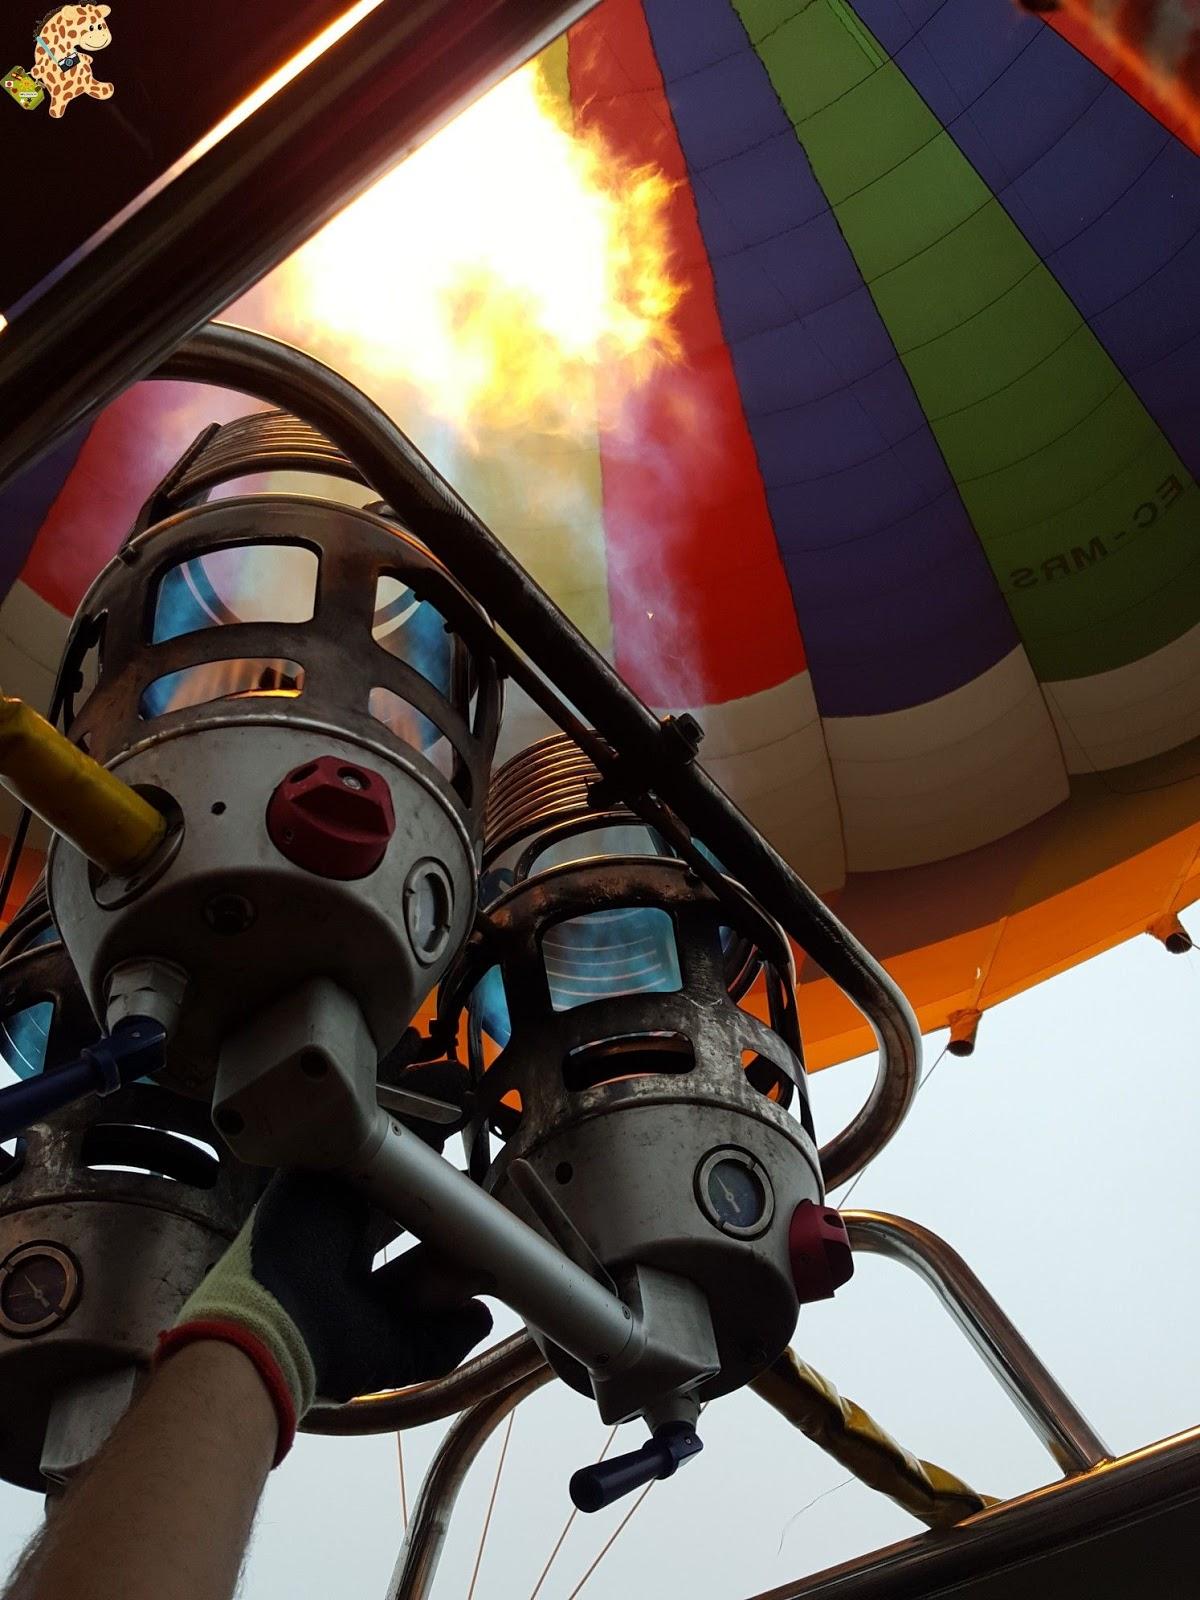 Volar en globo por primera vez, en globo por la Ribeira Sacra